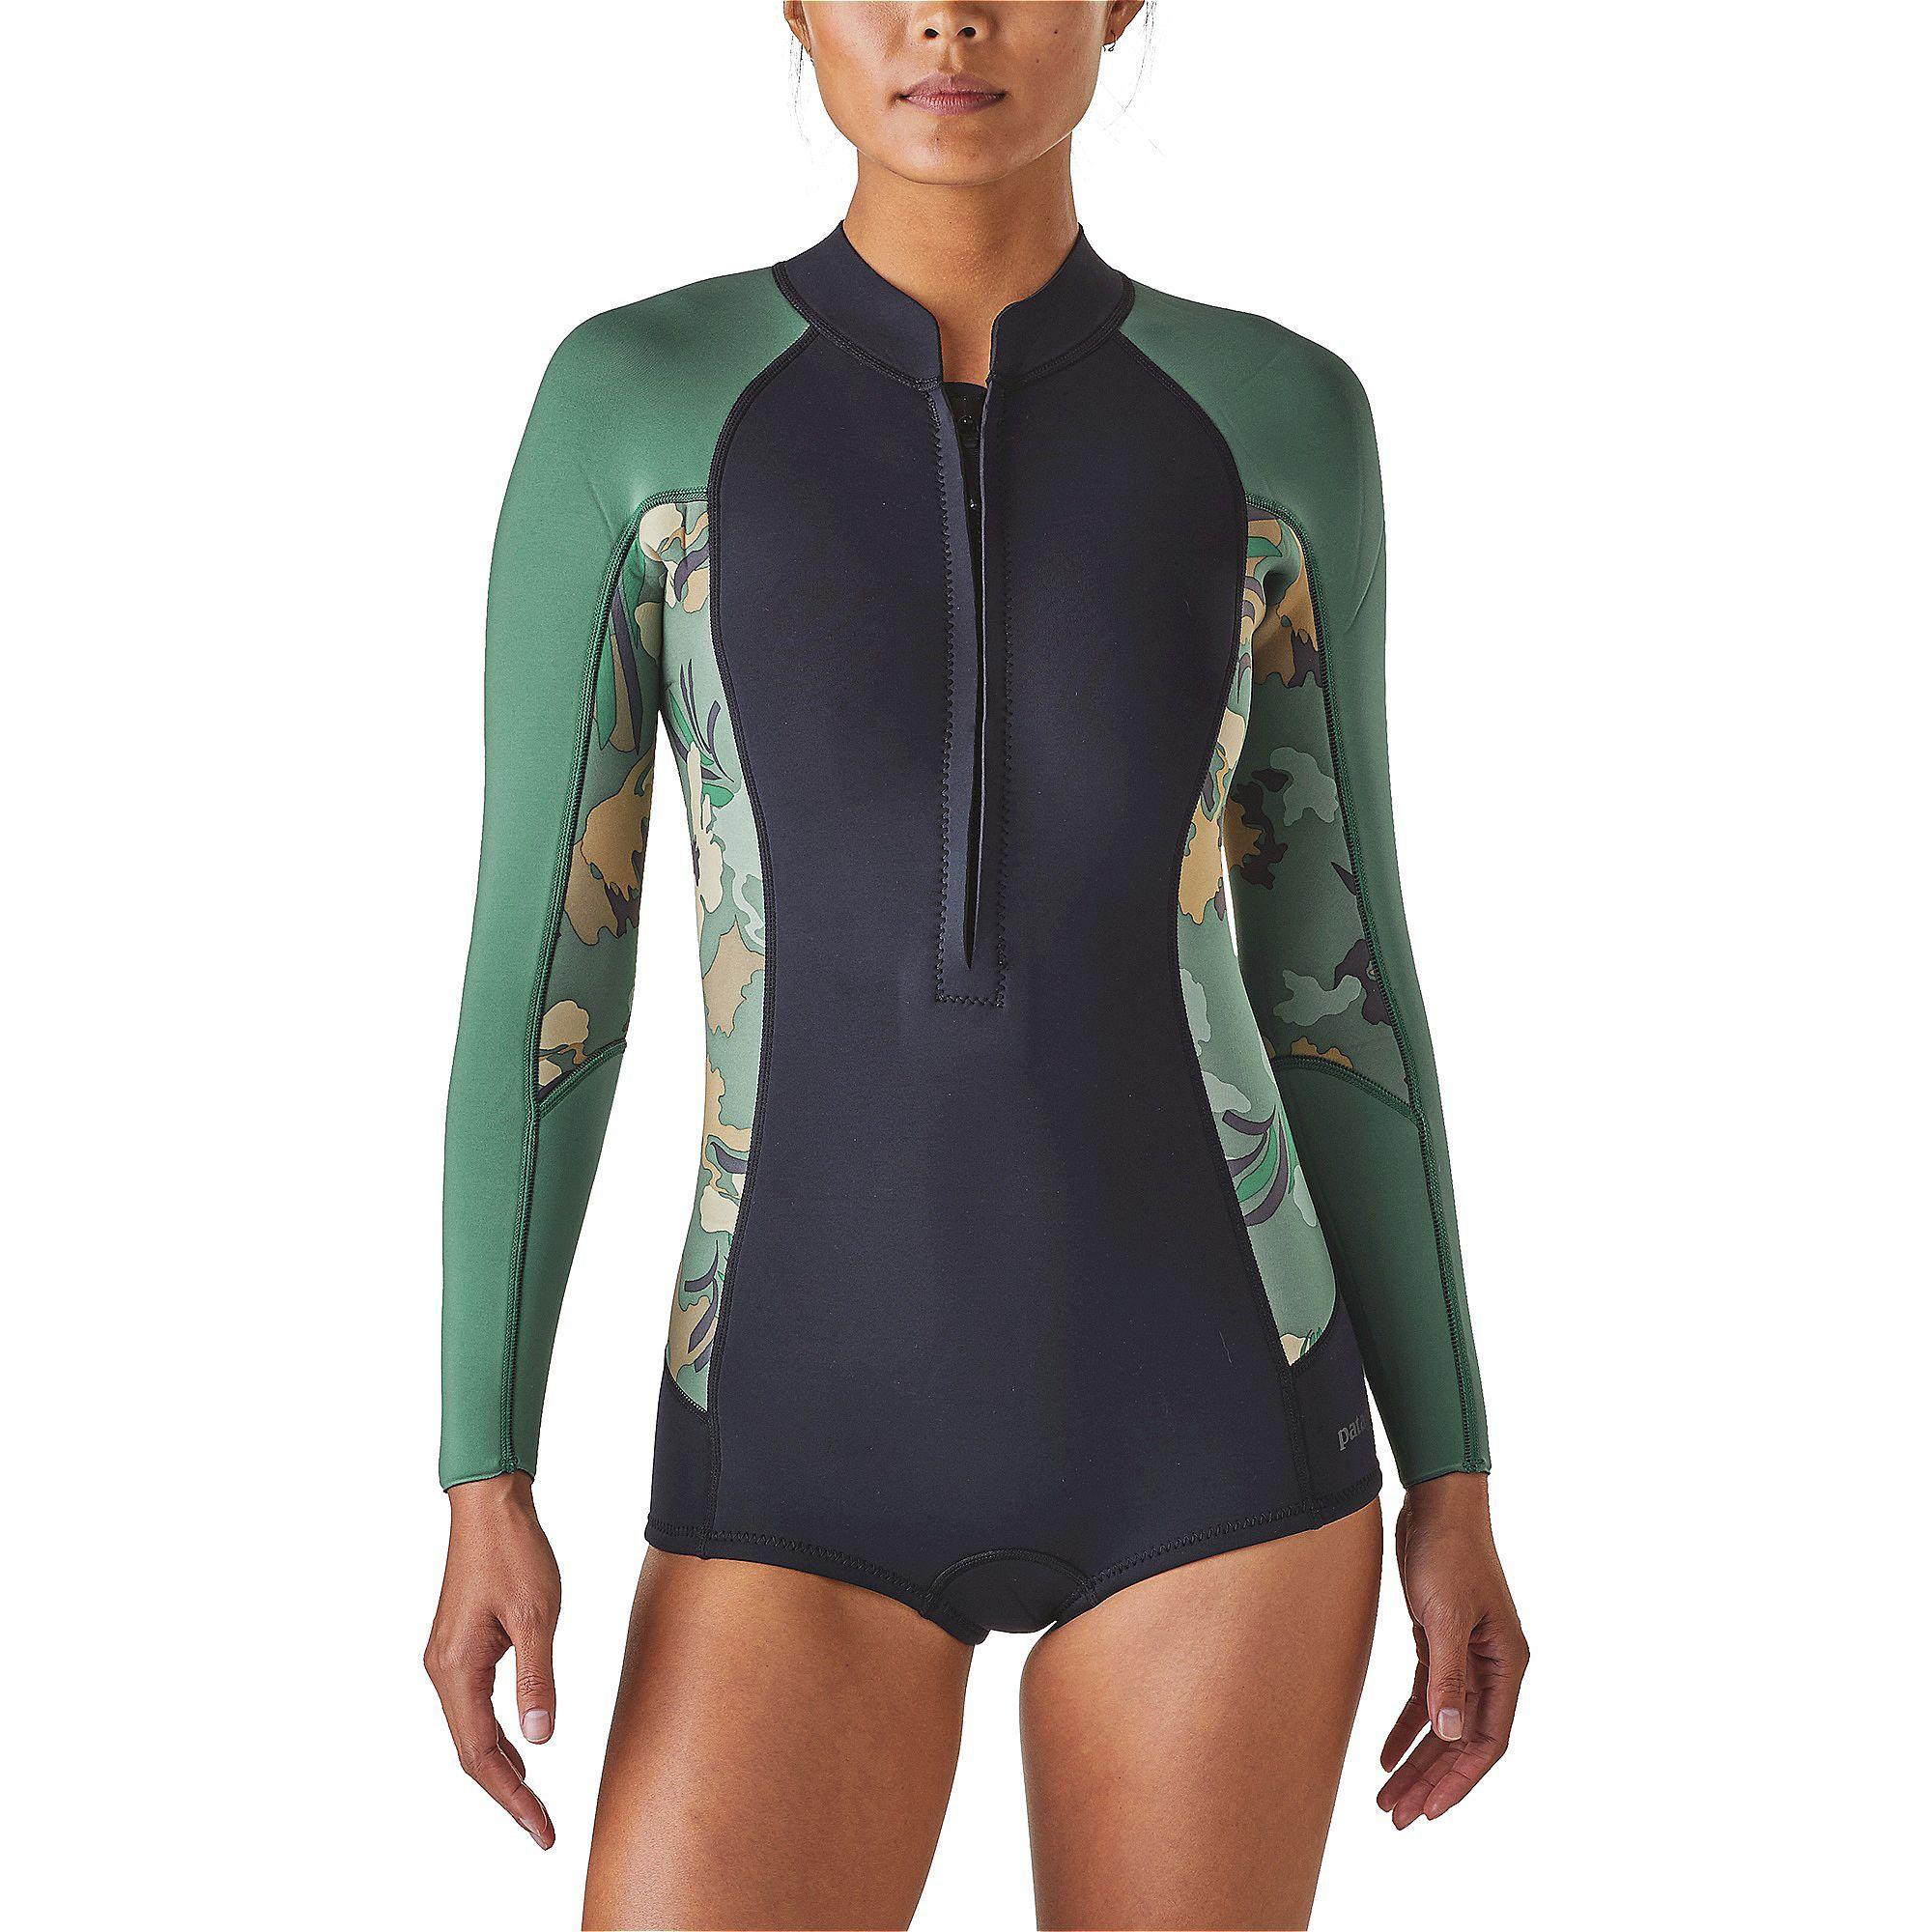 c4fcf3c712 Patagonia Women s R1® Lite Yulex® L S Spring Jane Wetsuit